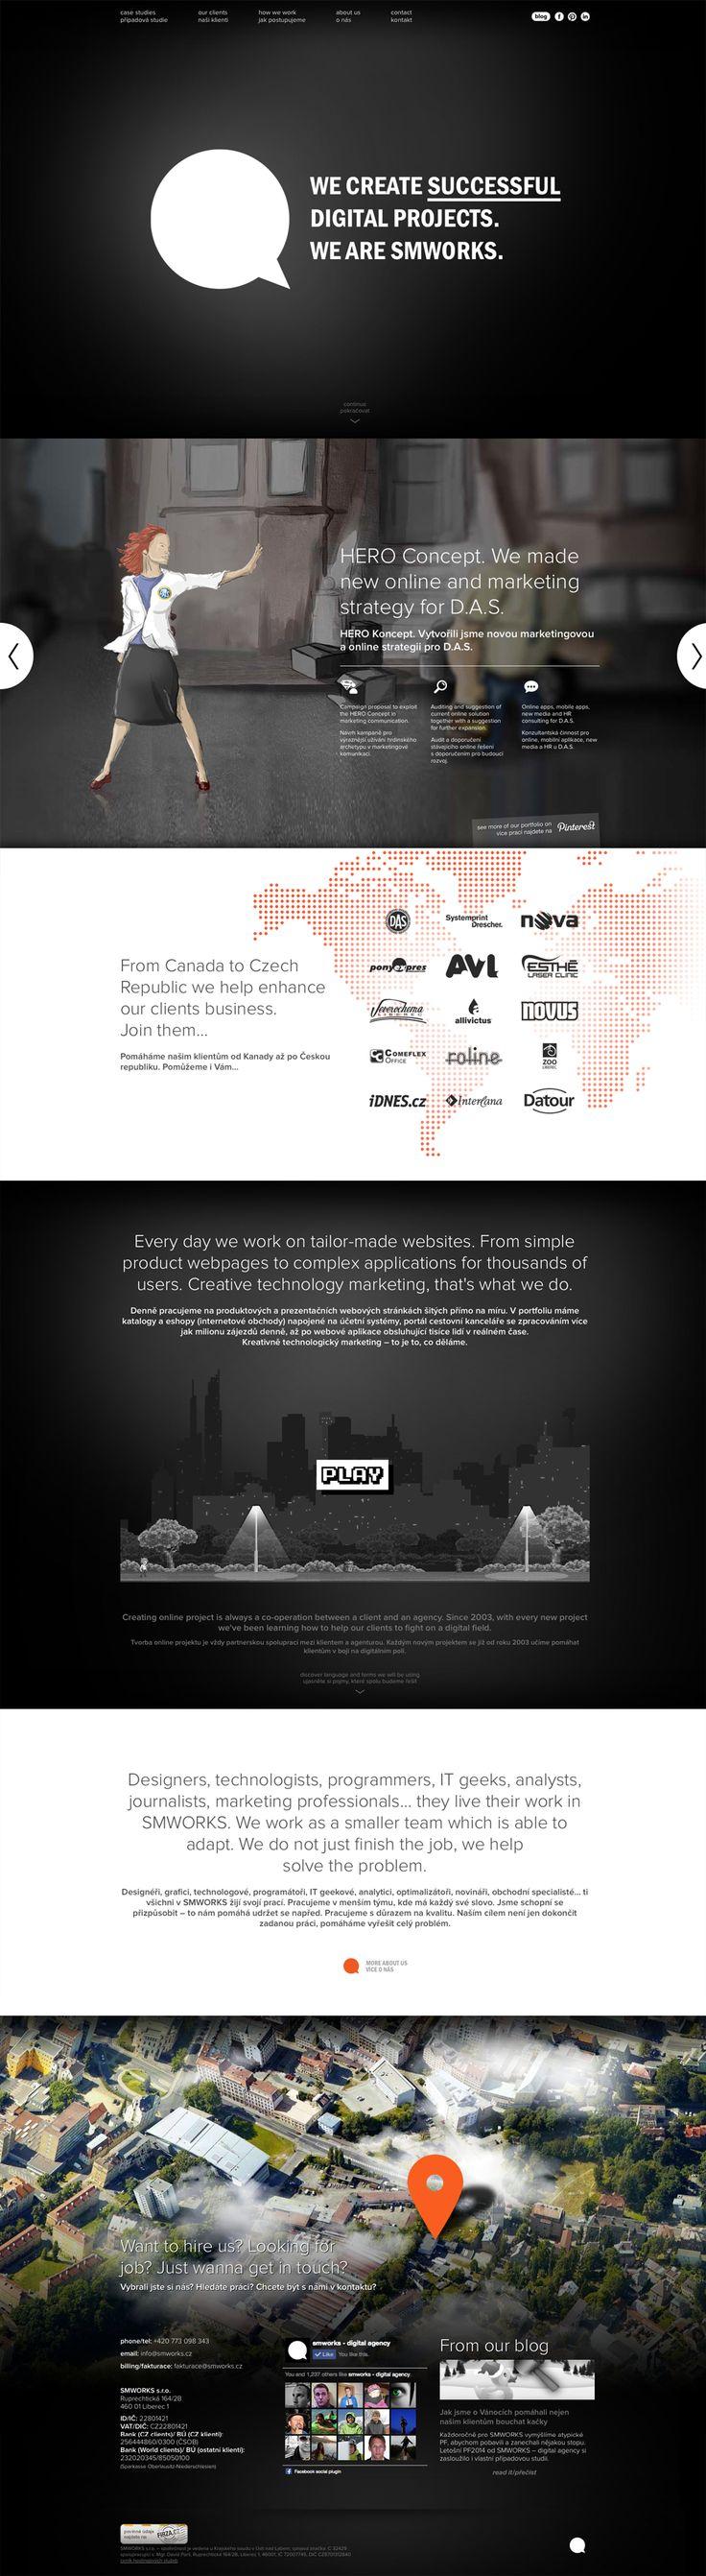 web for our agency - version 2004 #prallax clouds #case studies #game #website #digitalagency #smworks www.smworksdigital.com